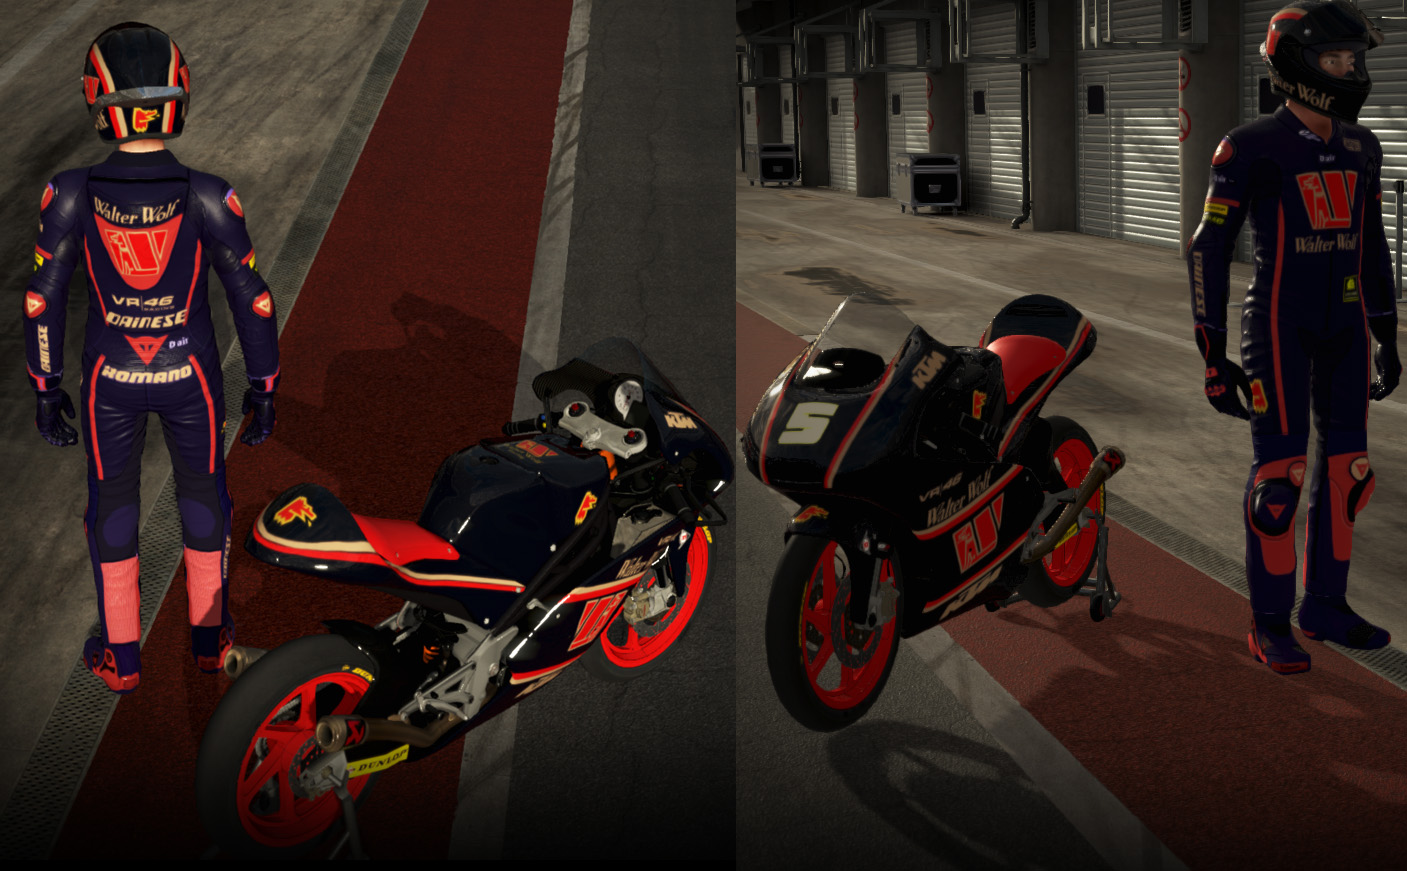 WW_Racing001.jpg